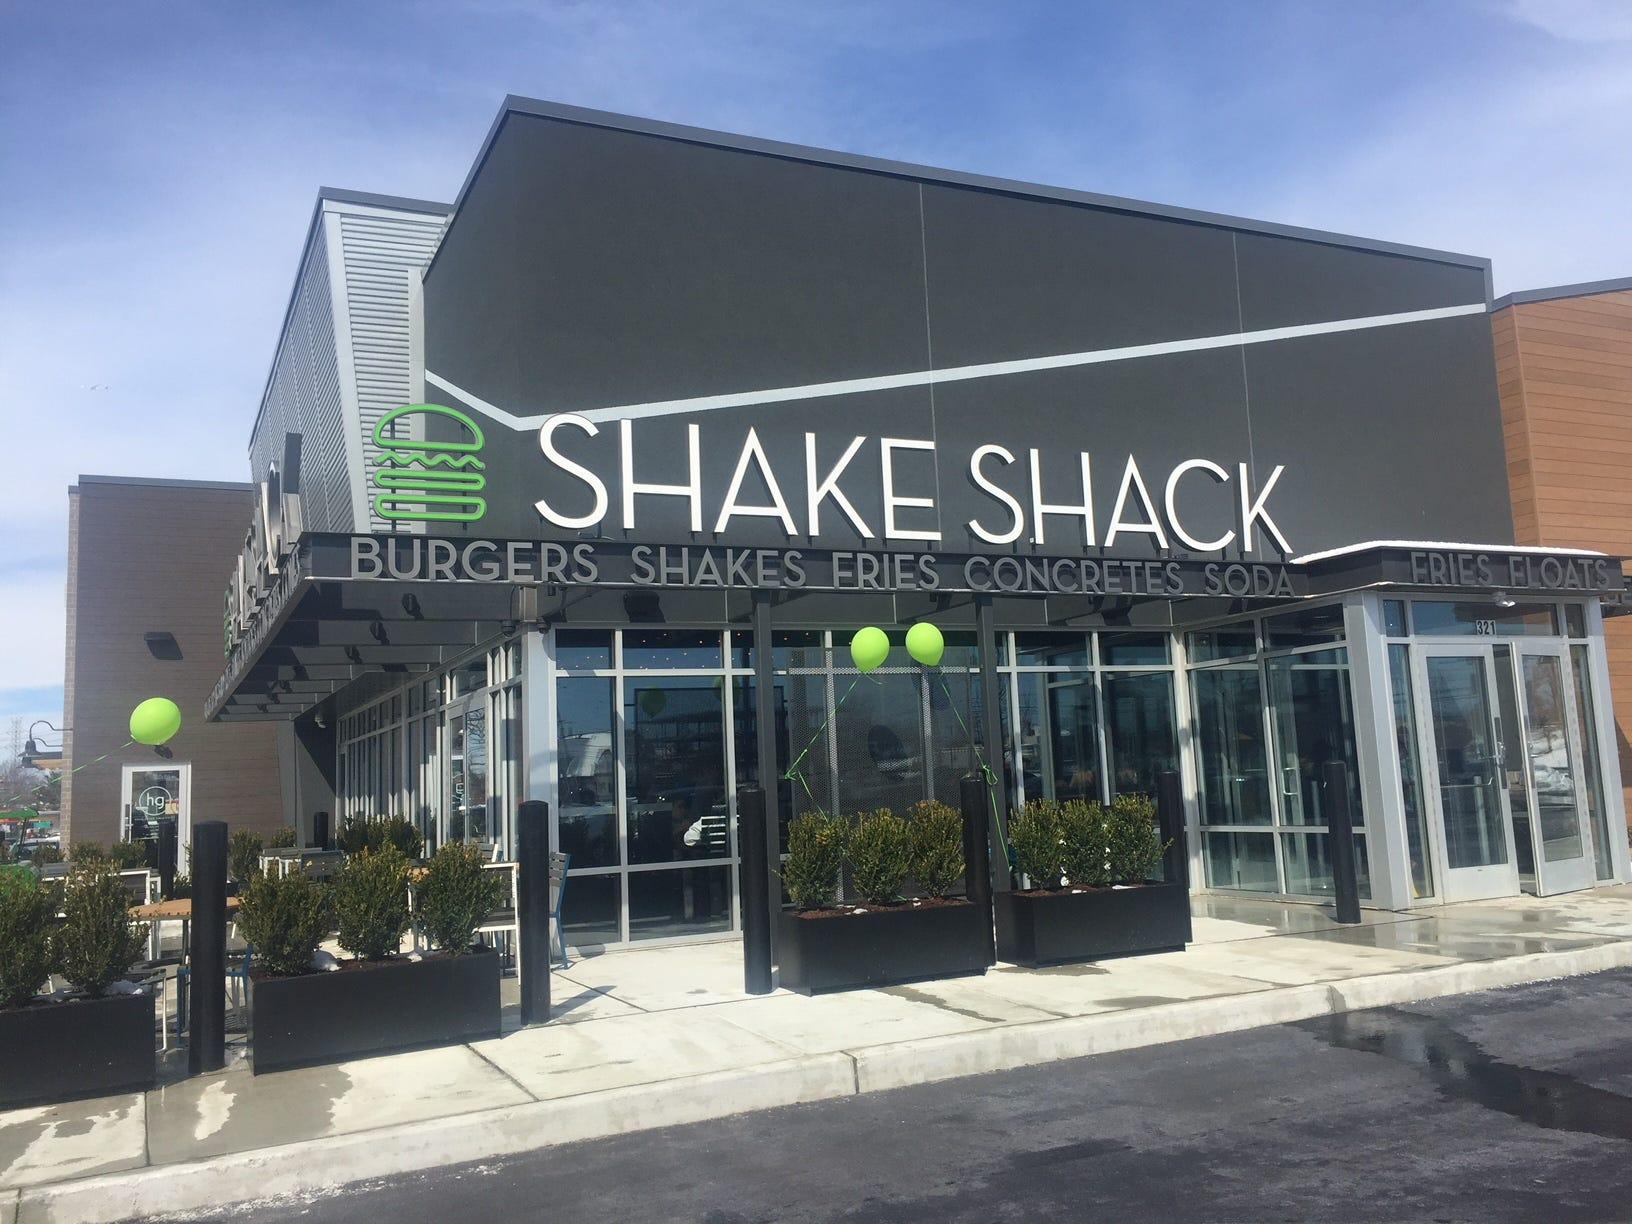 image regarding Shake Shack Printable Coupons identified as Shake shack promotions / Taking pictures systems